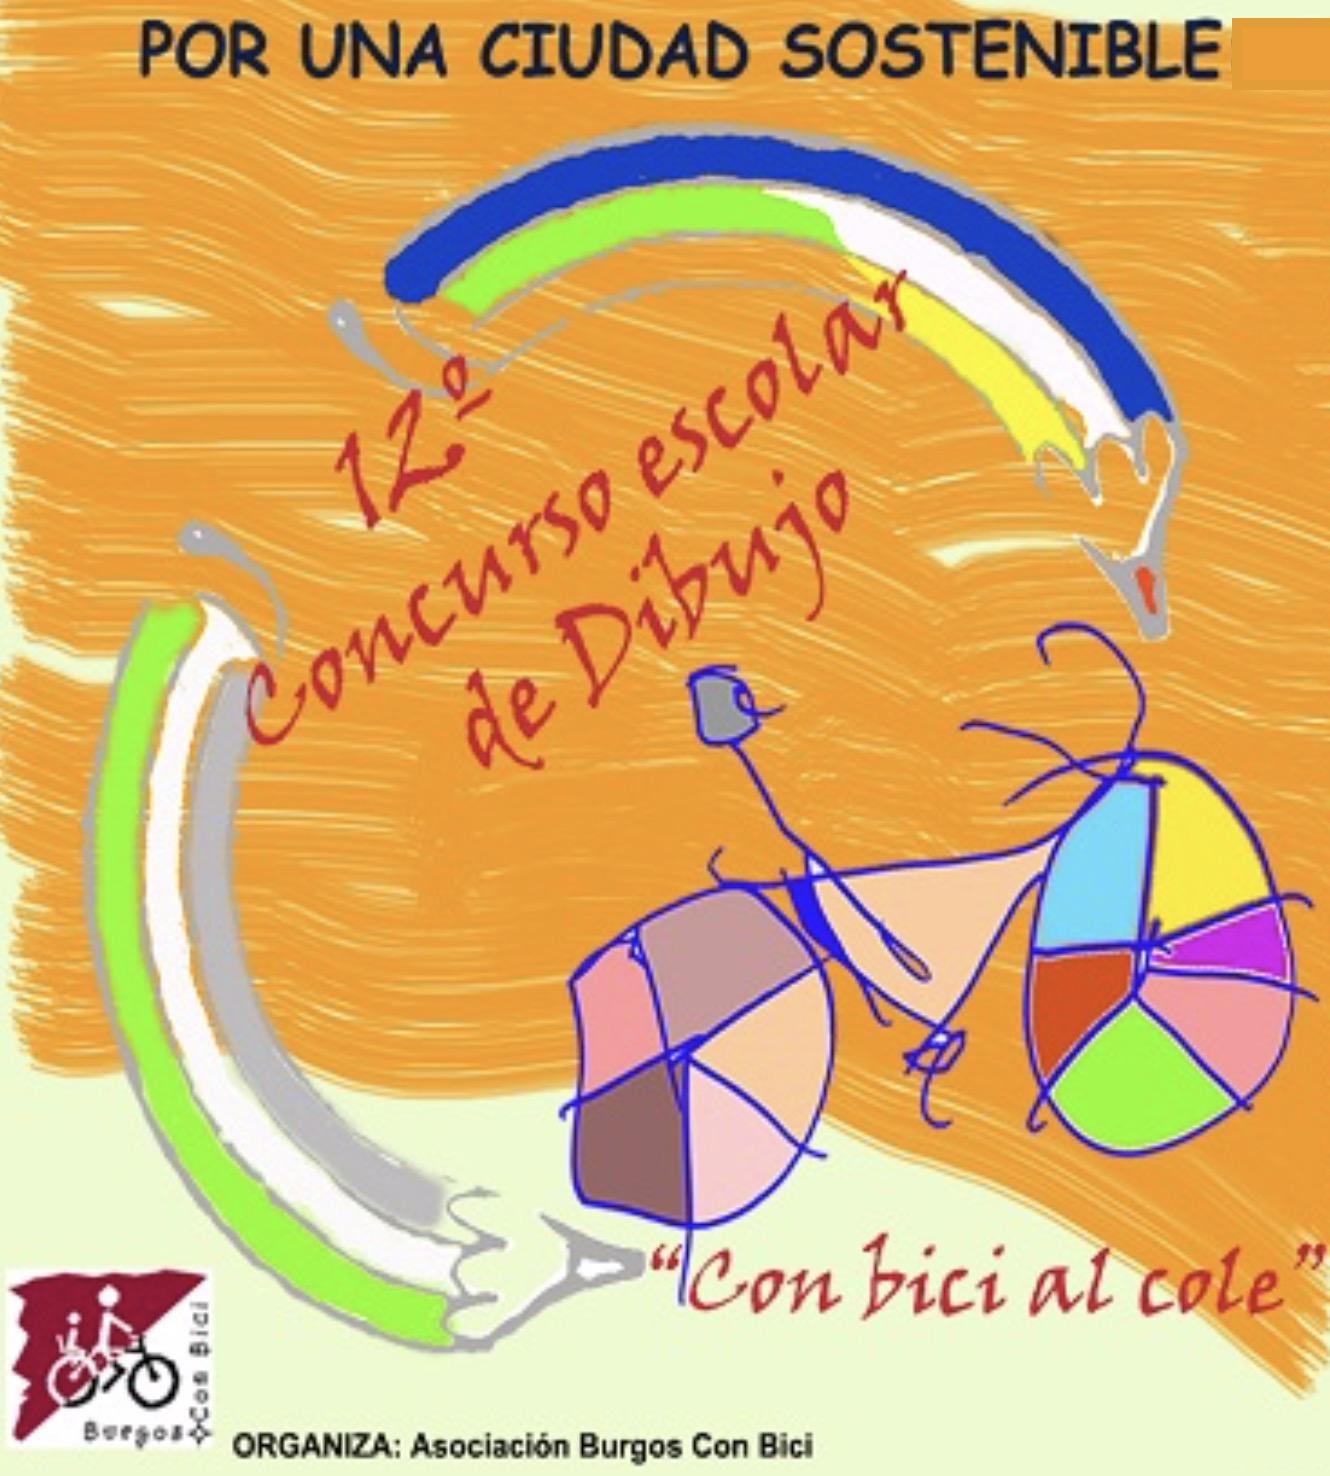 Cartel convocatoria de concurso de dibujo escolar con bici al cole